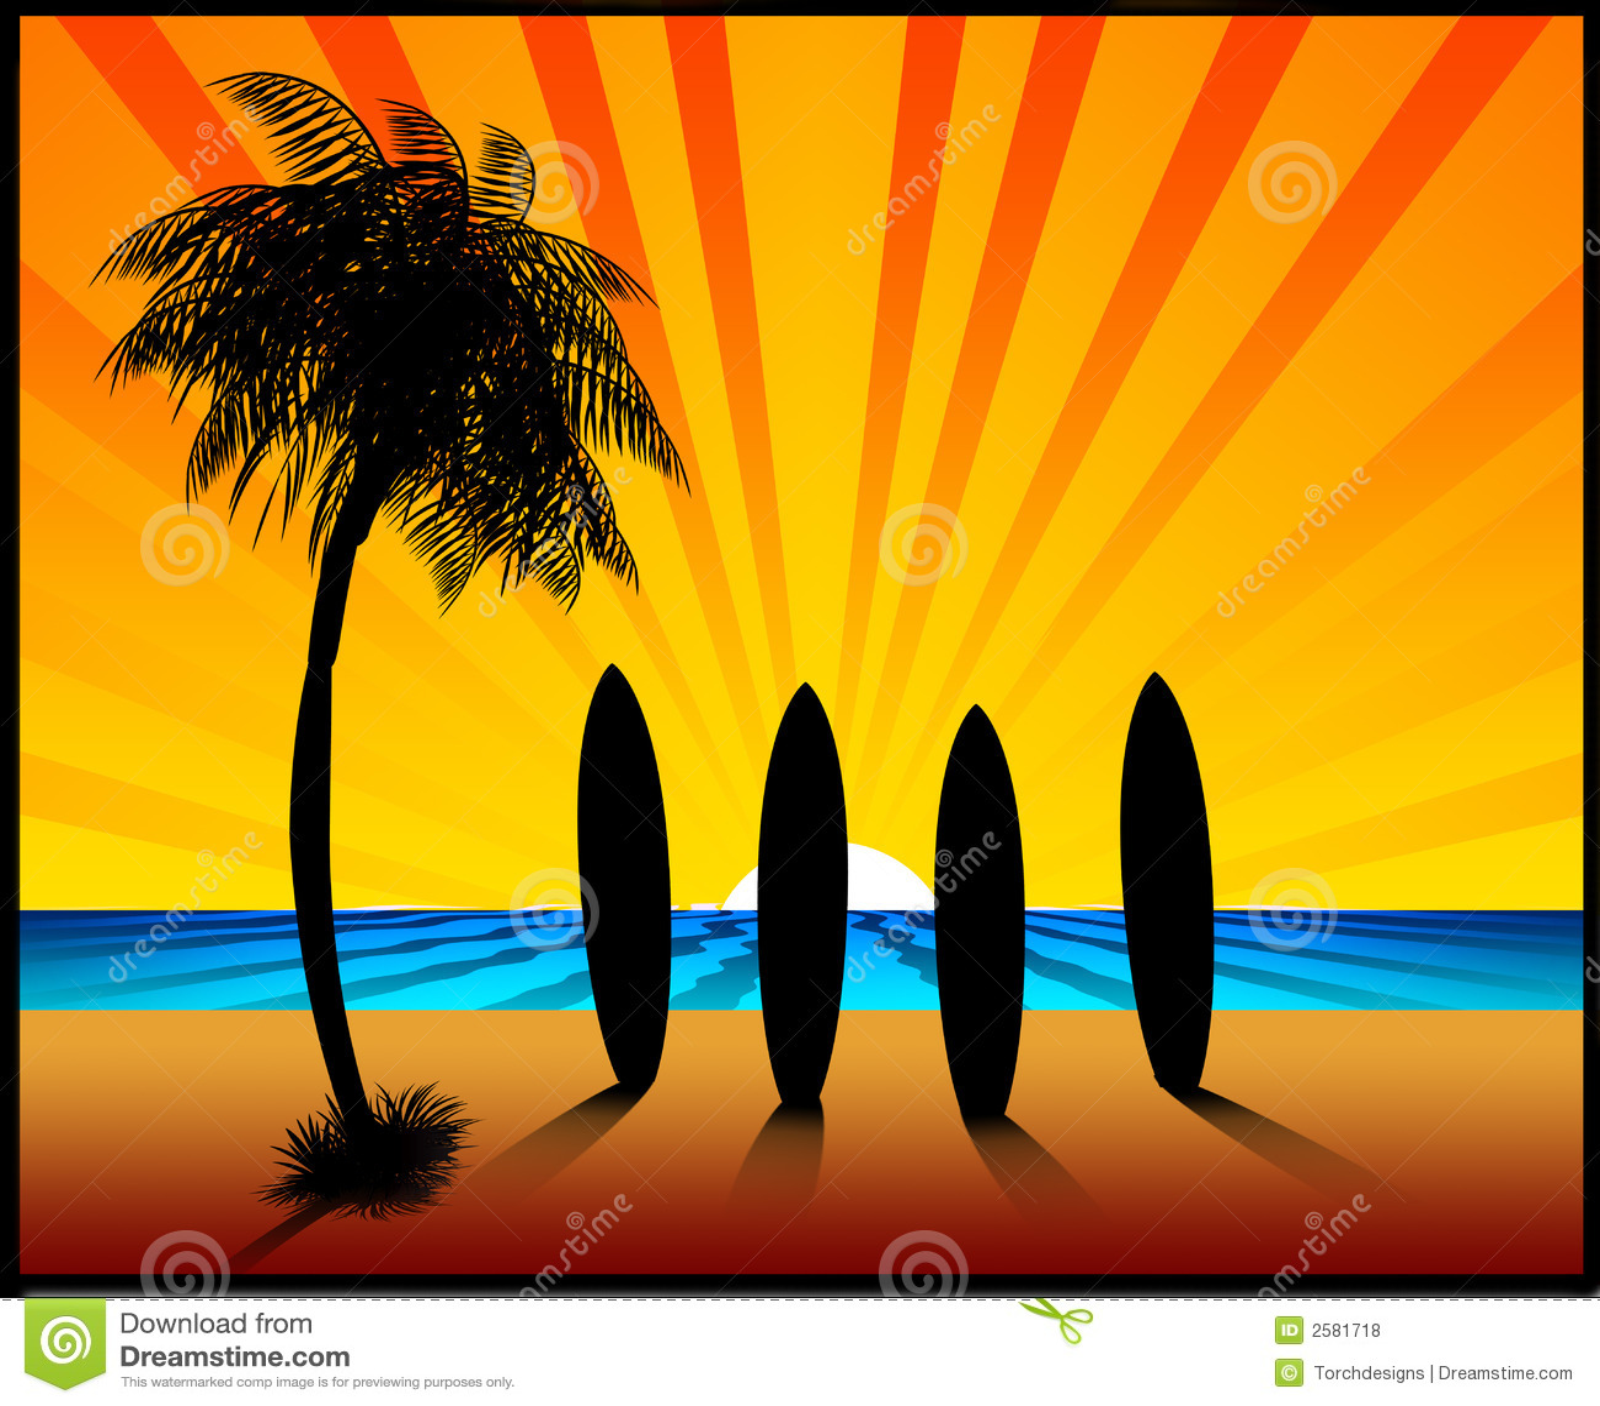 Surfboards Stock Illustrations – 1,711 Surfboards Stock ...